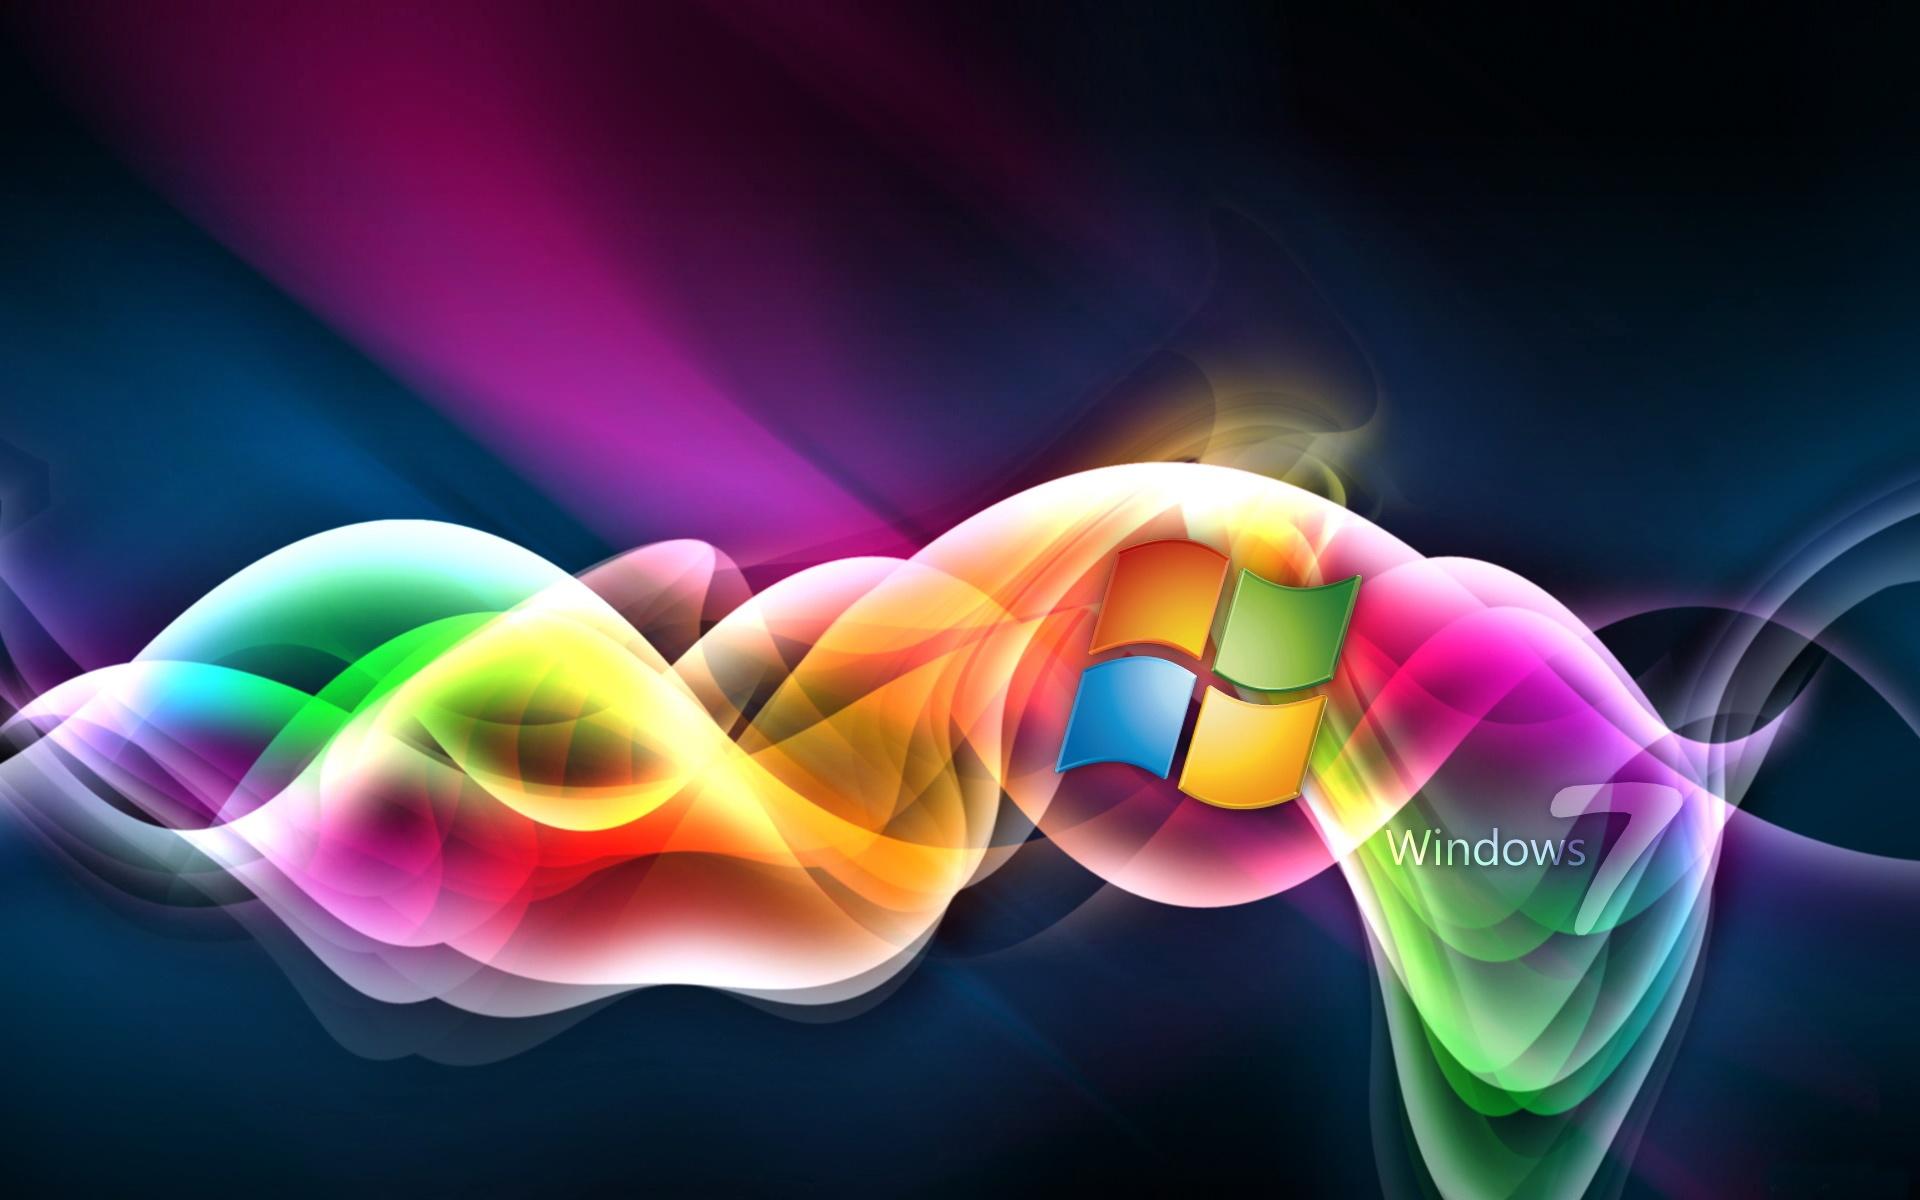 45 Spectacular Windows 7 Desktop Backgrounds